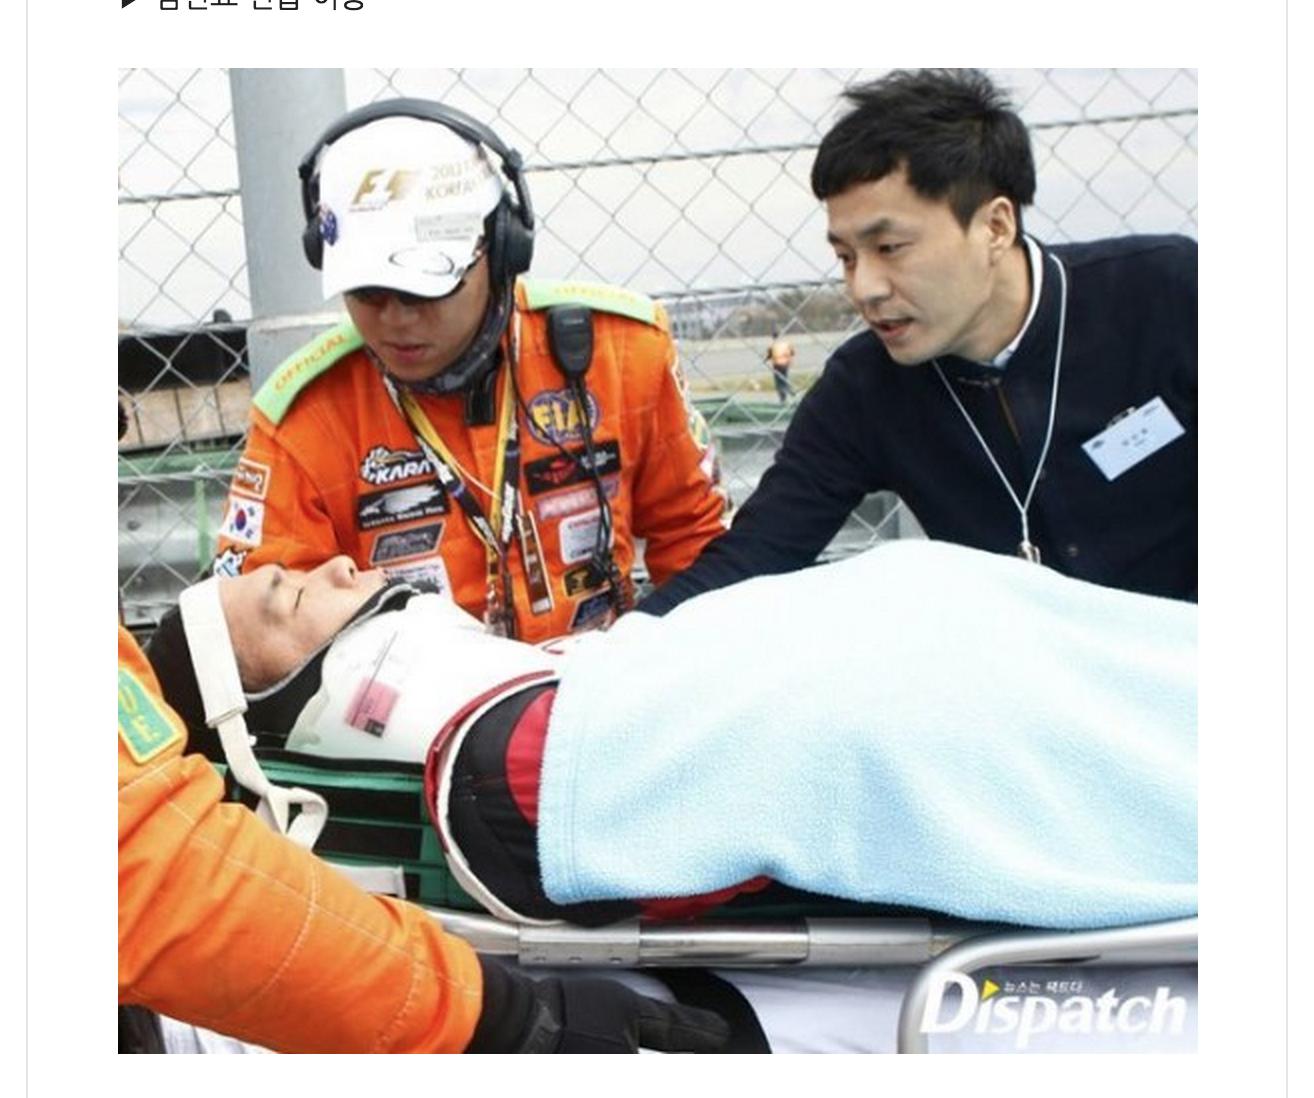 kim jin pyo crash 2